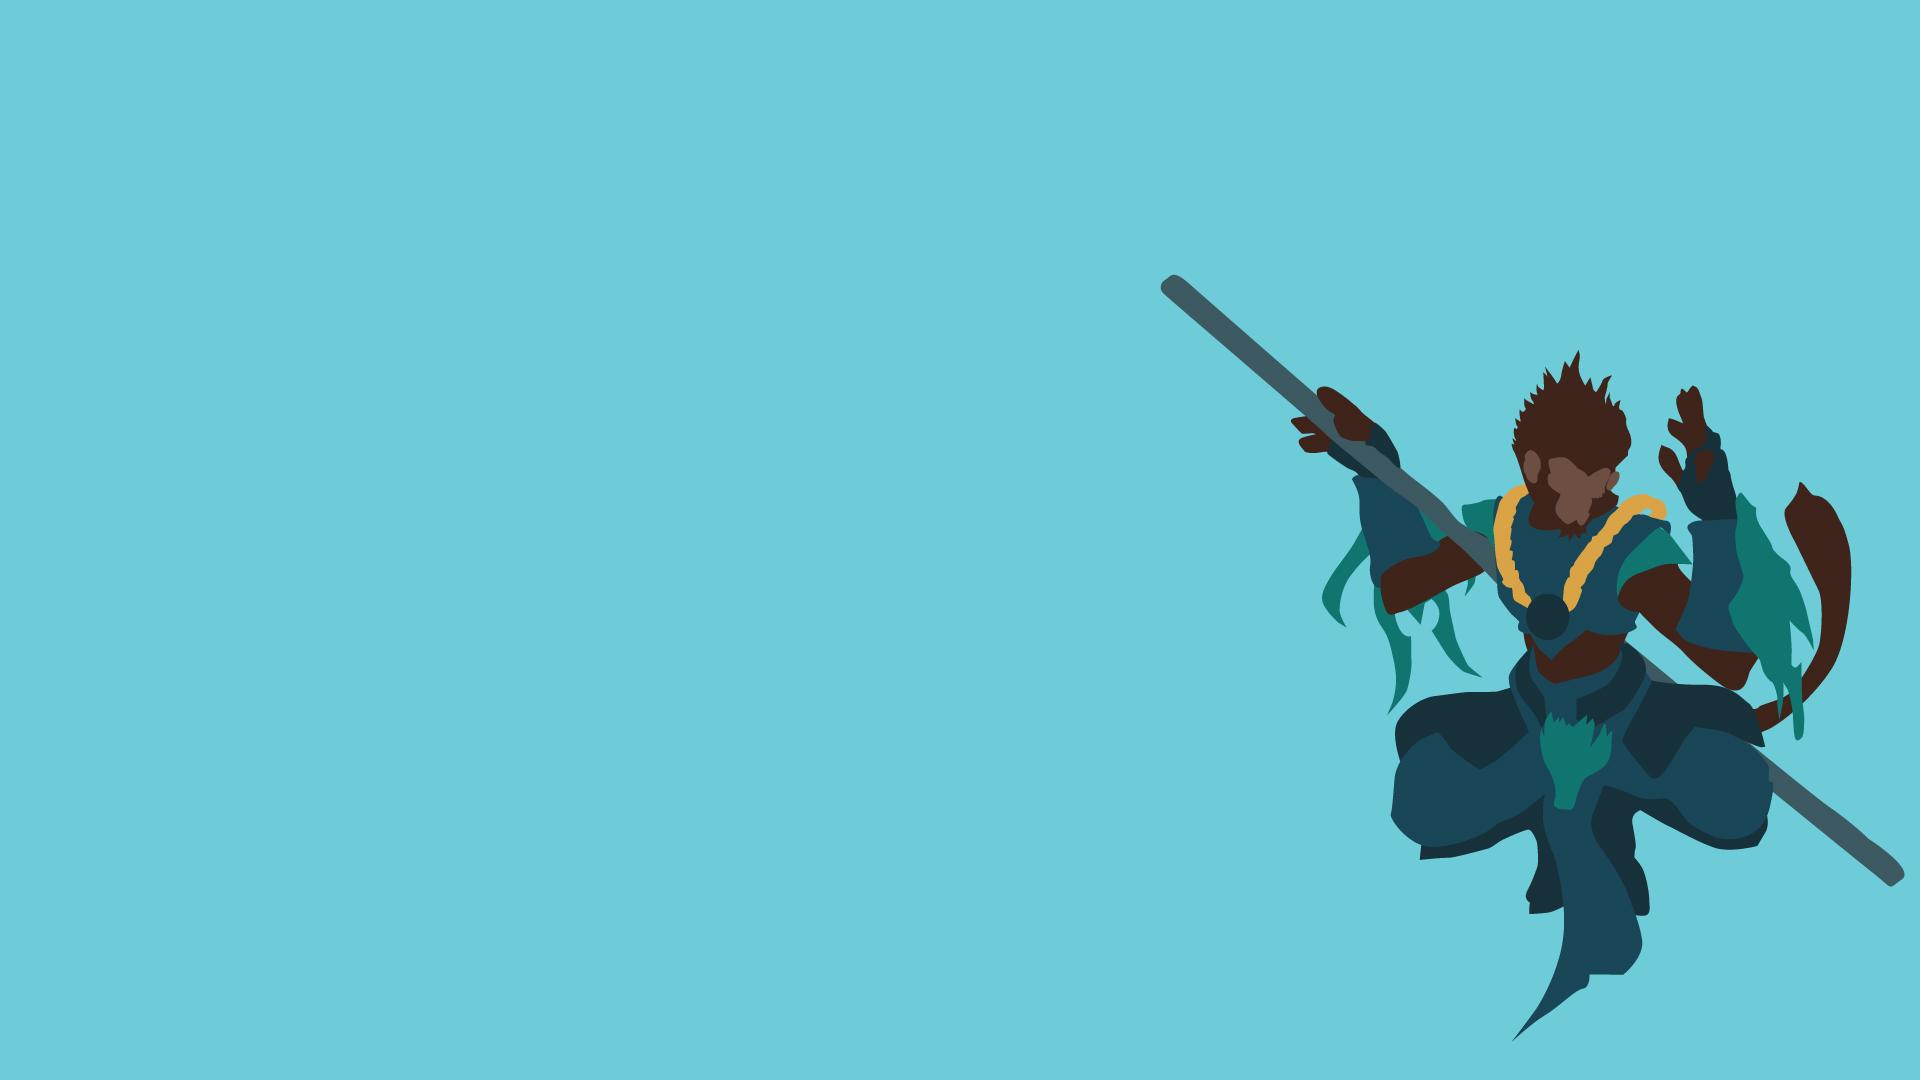 Wukong Minimalistic wallpaper